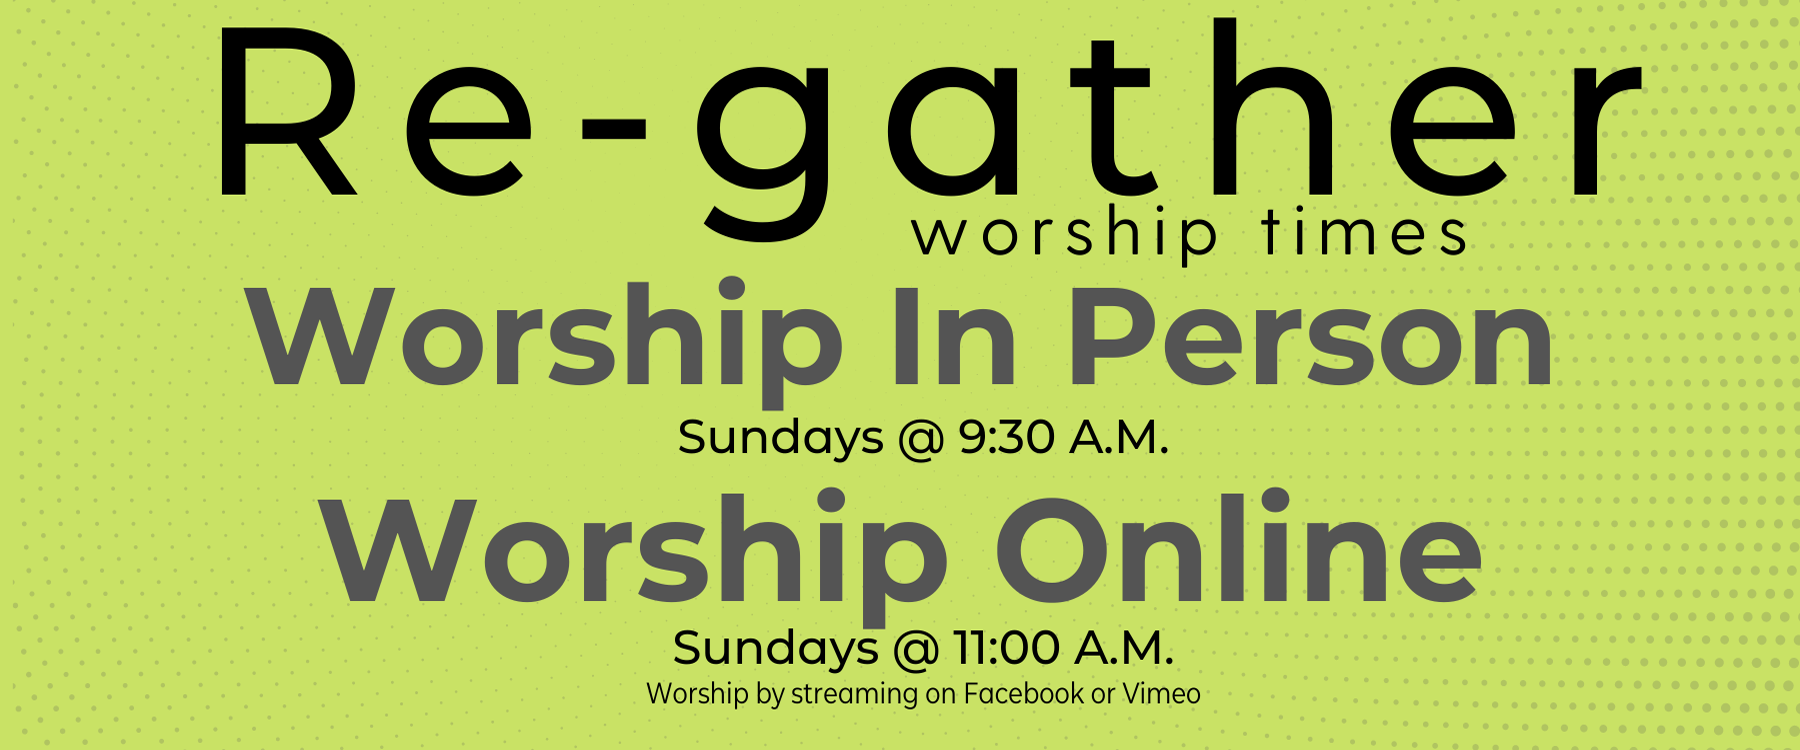 Regather worship times - Website 2